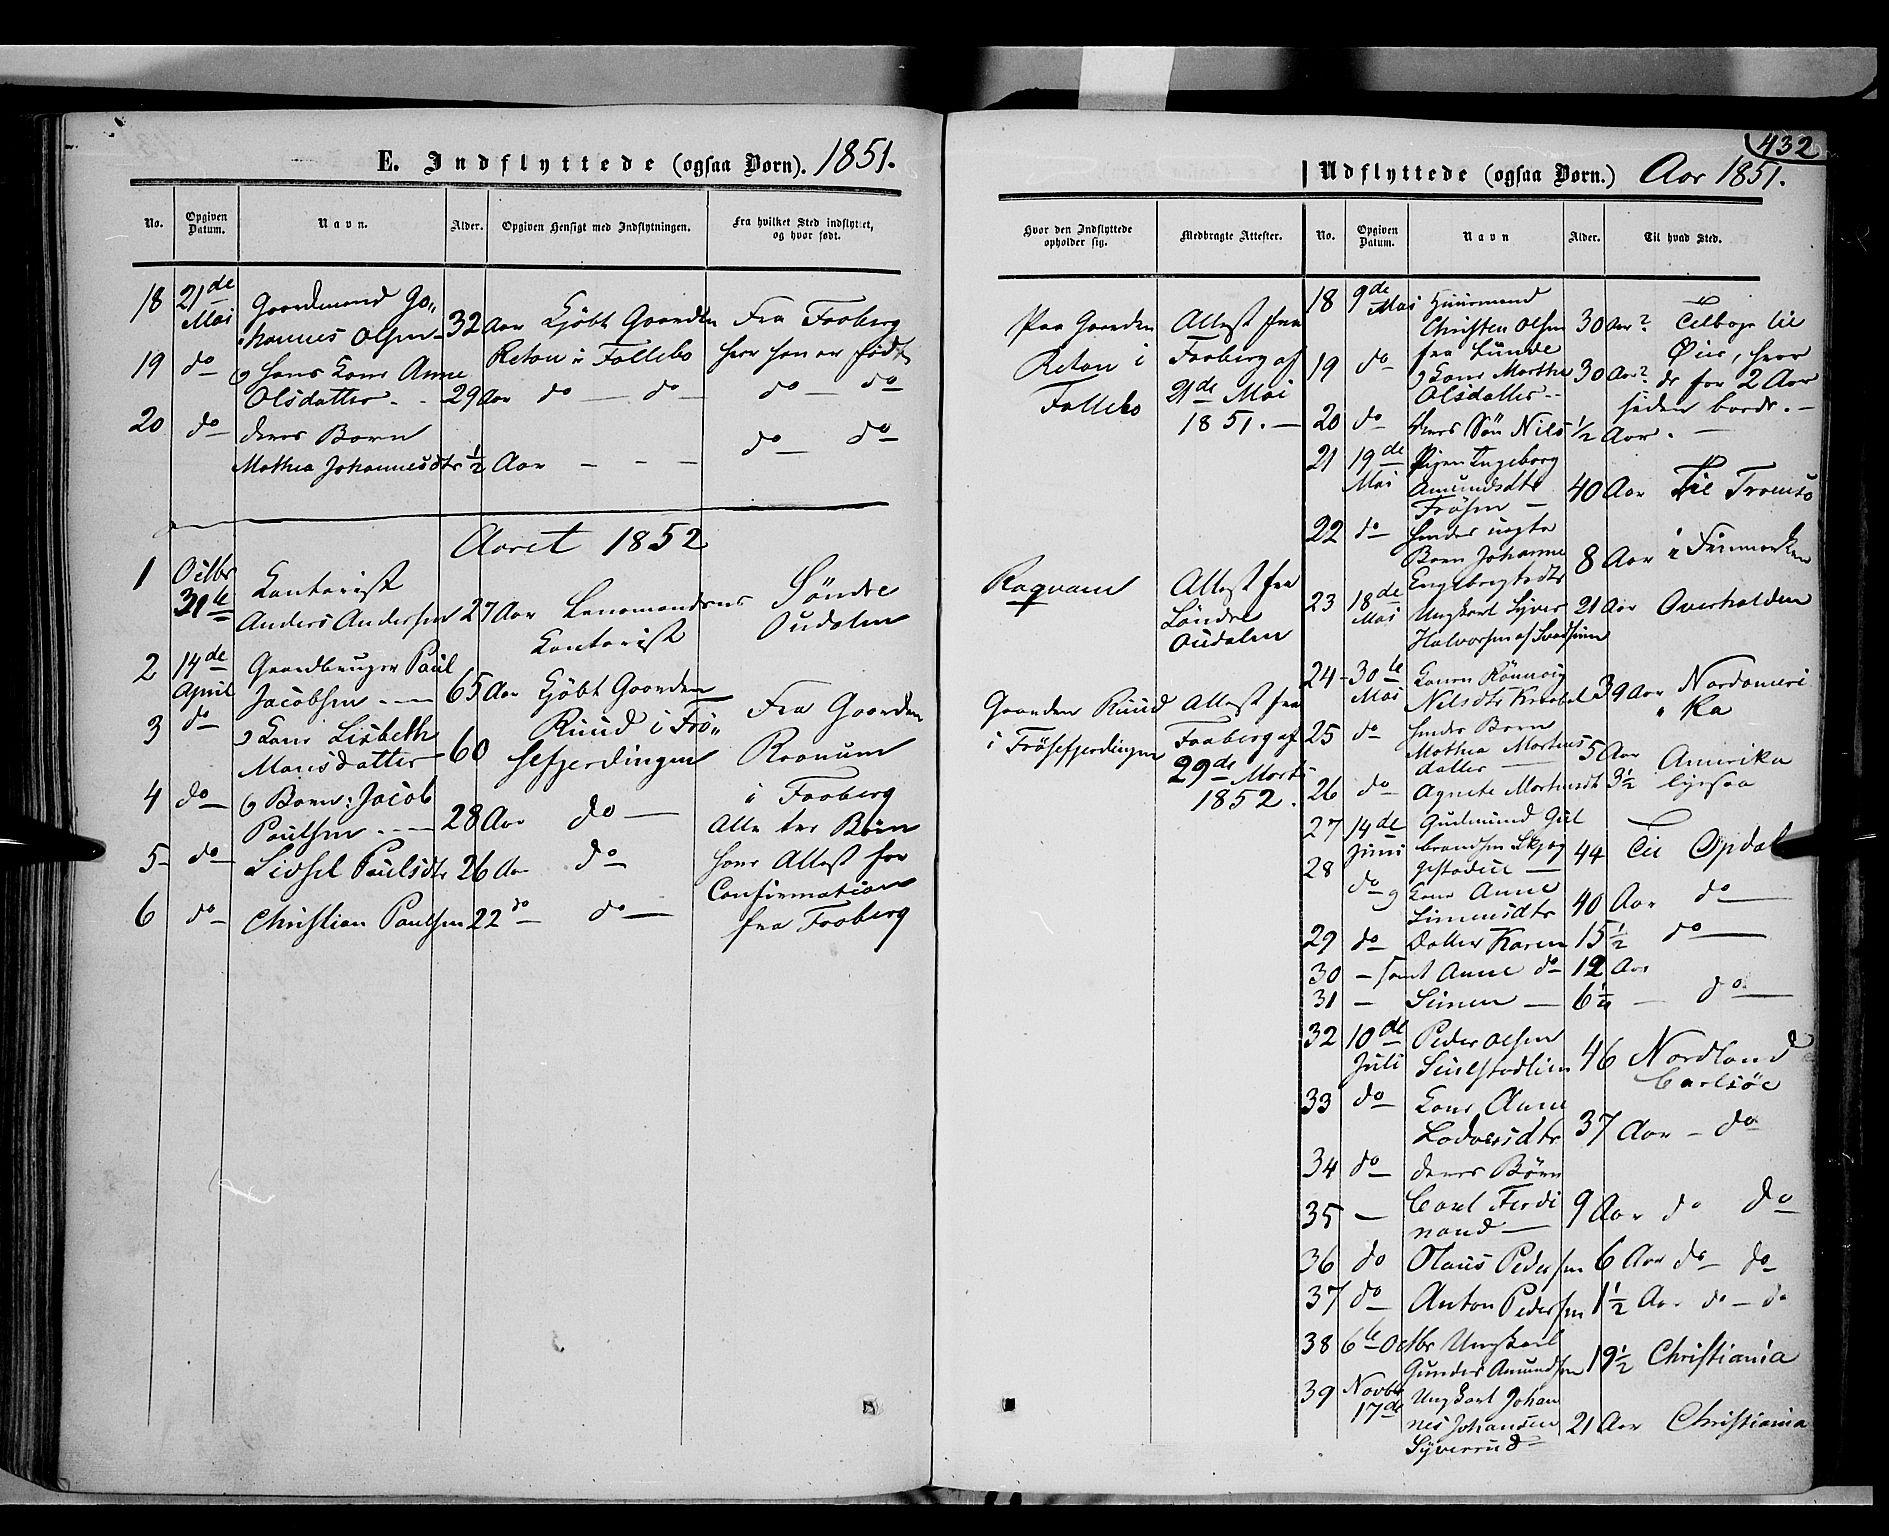 SAH, Gausdal prestekontor, Ministerialbok nr. 8, 1850-1861, s. 432